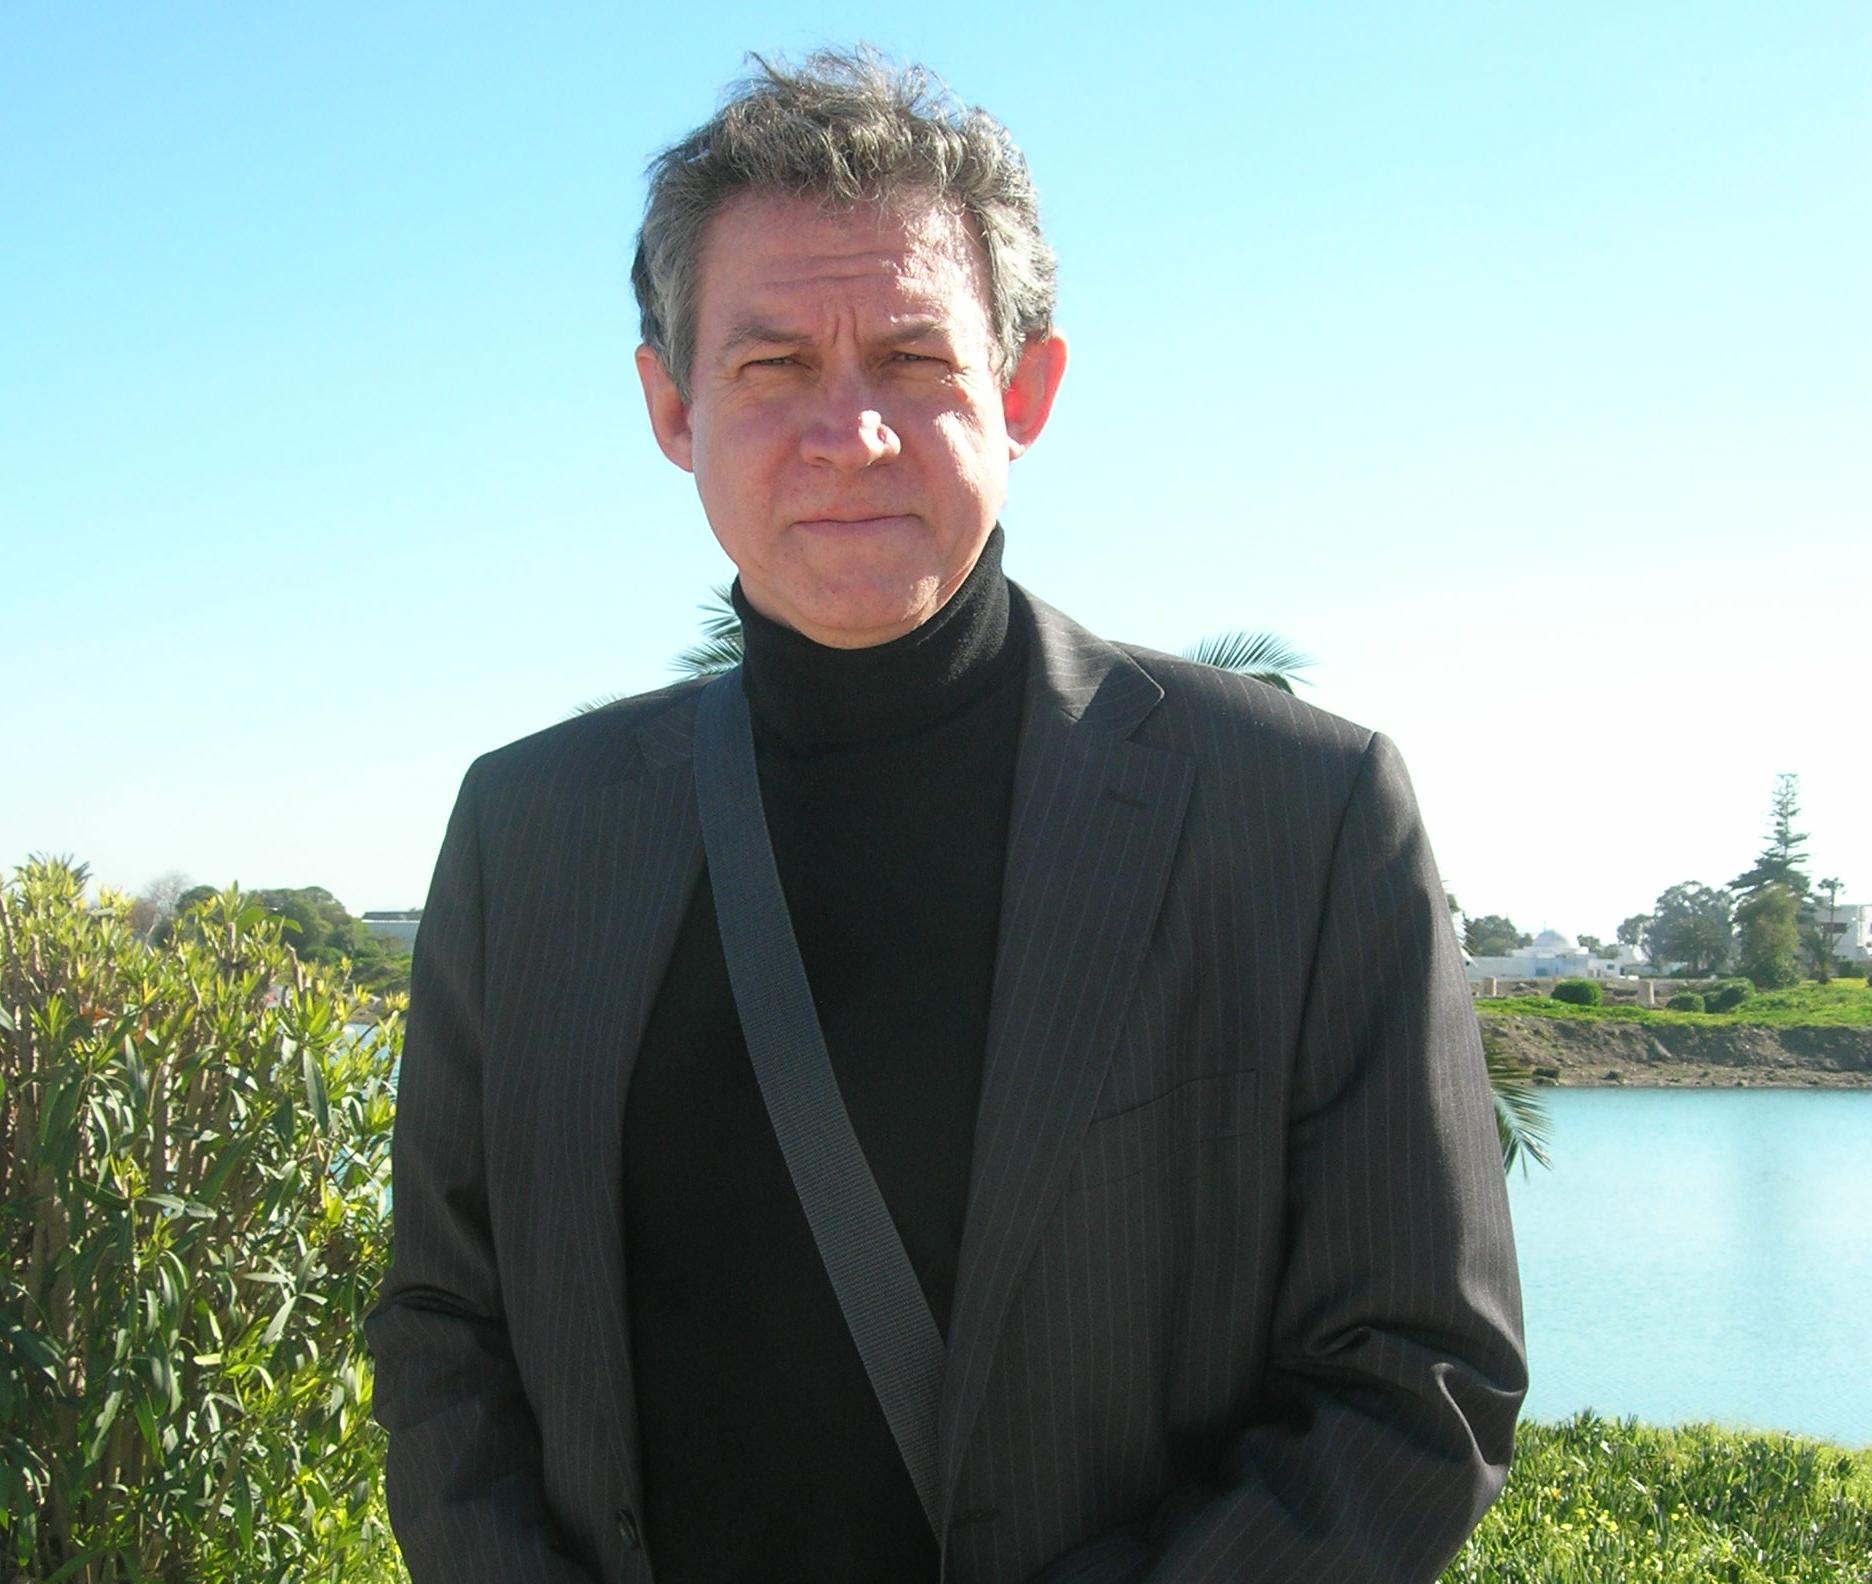 Patrick Voisin